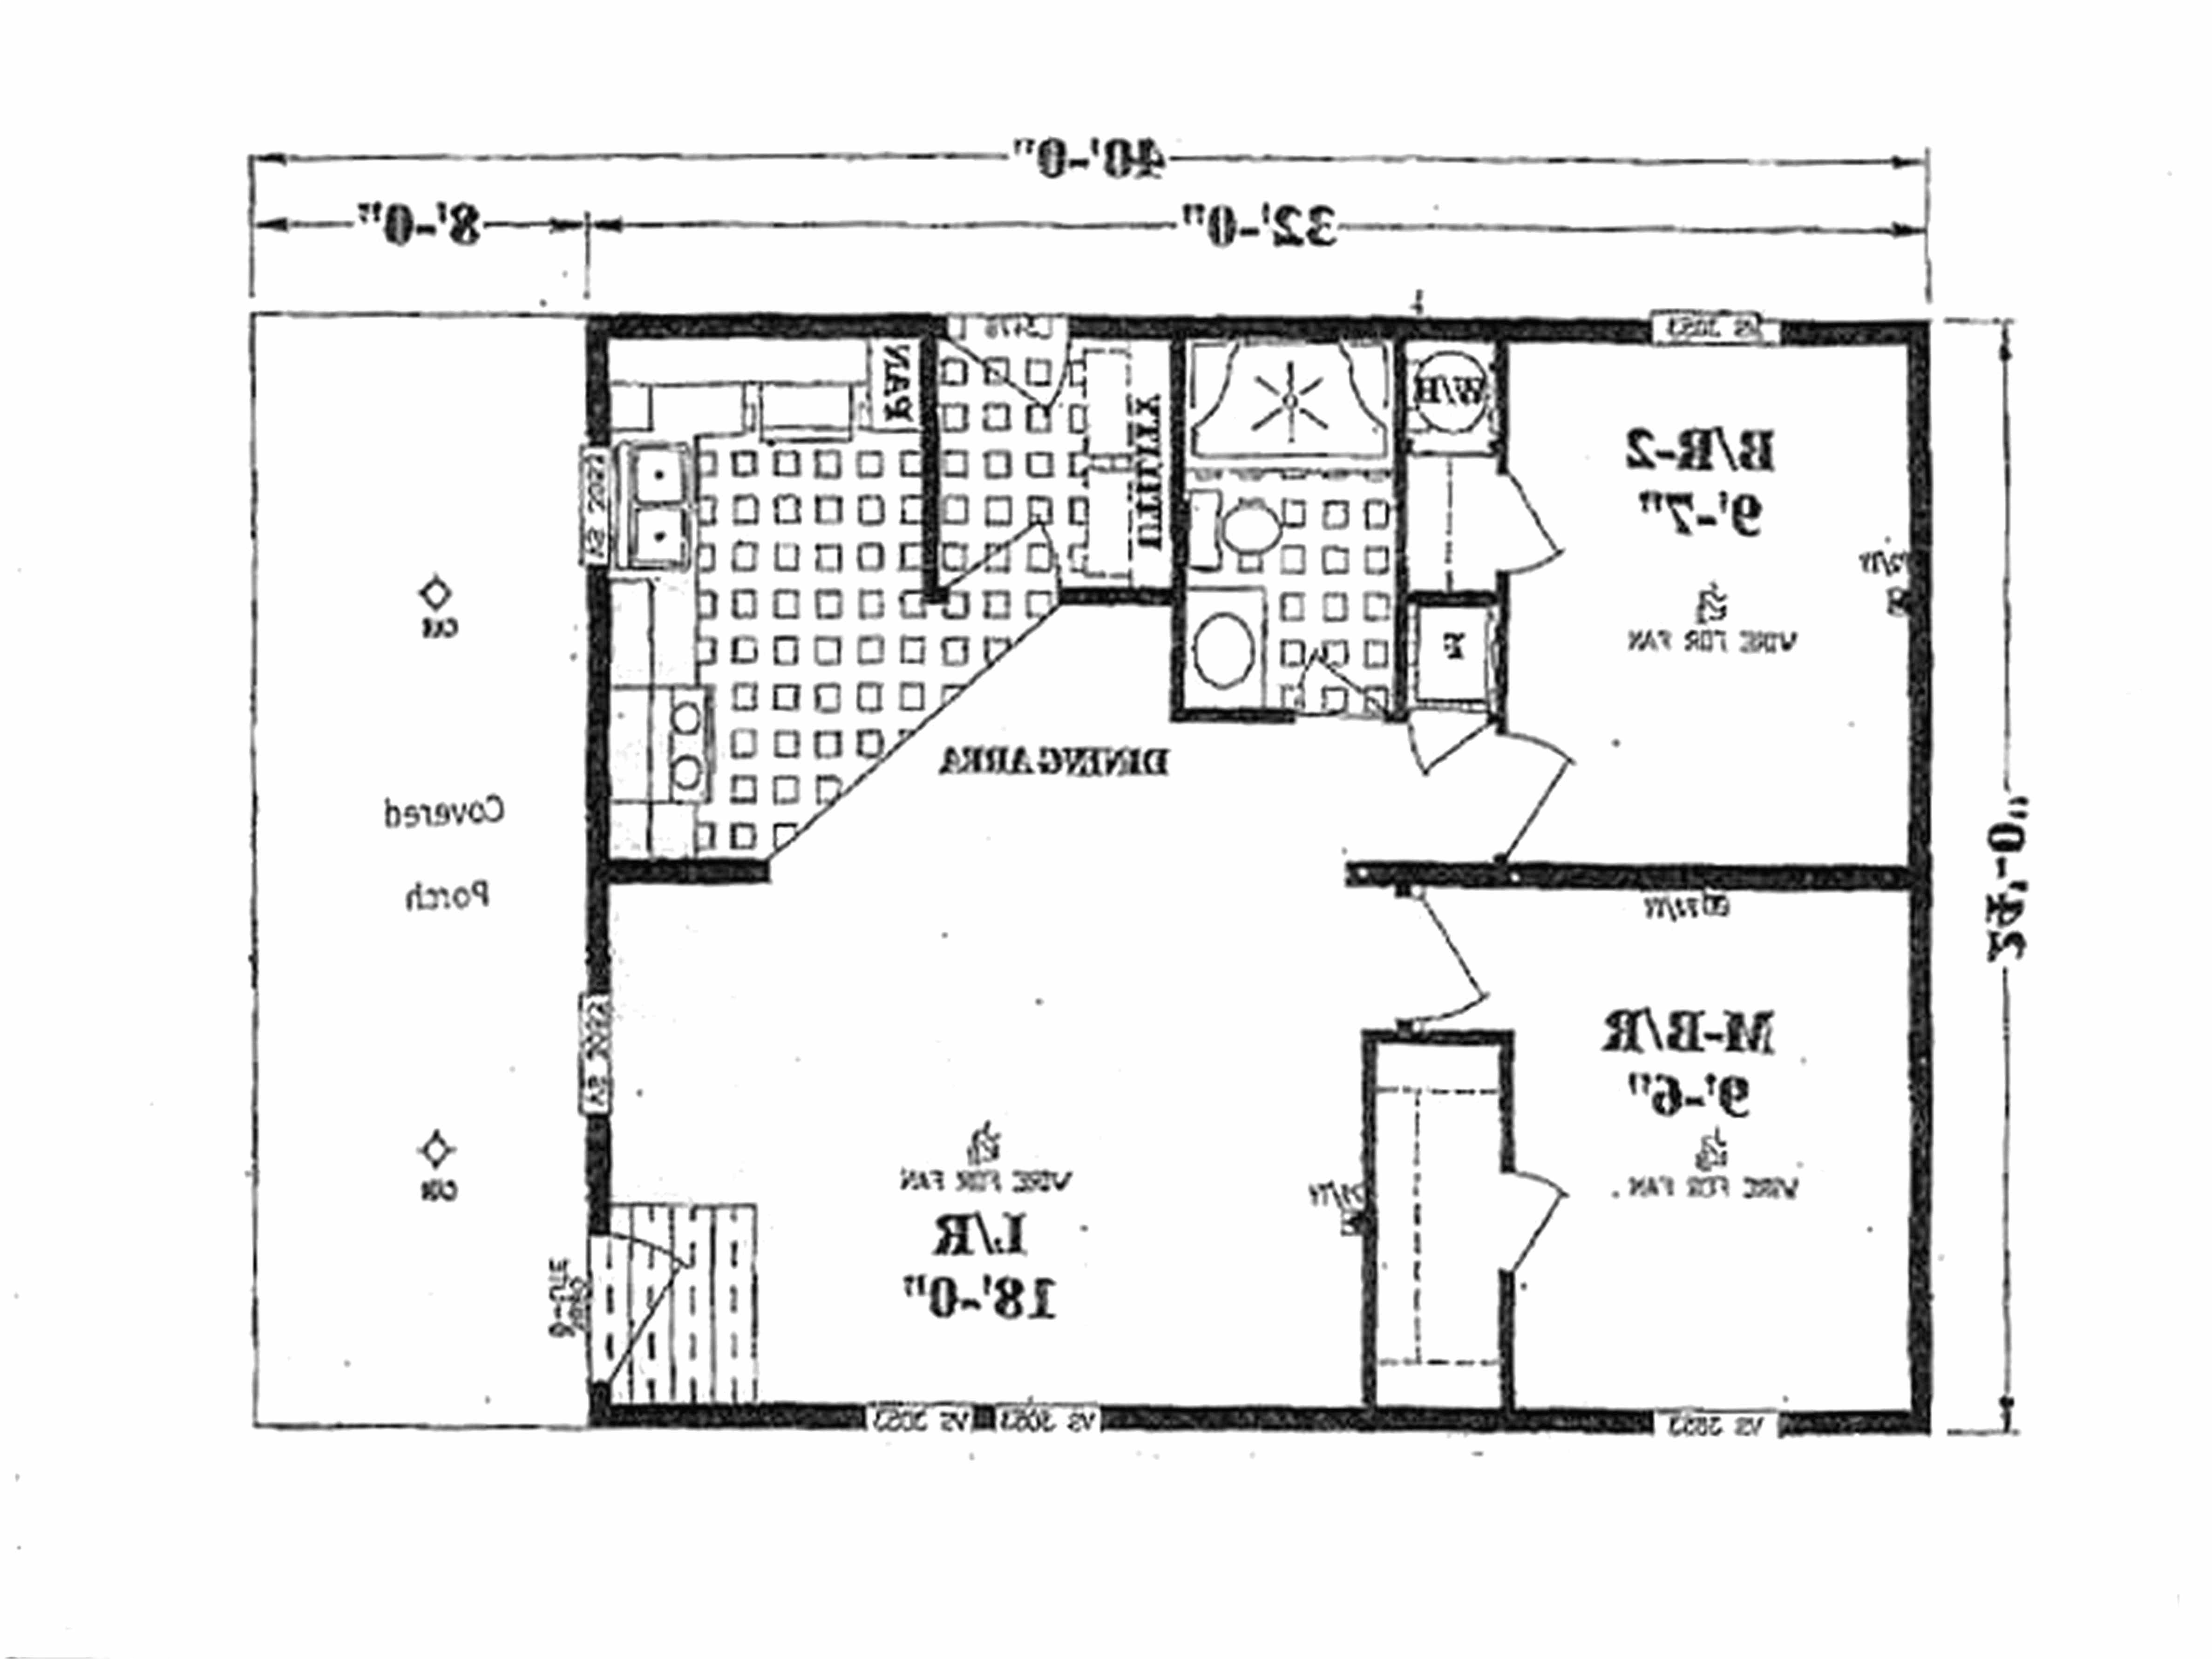 24 elegant sovereign homes floor plans sovereign homes floor plans new sovereign homes floor plans awesome